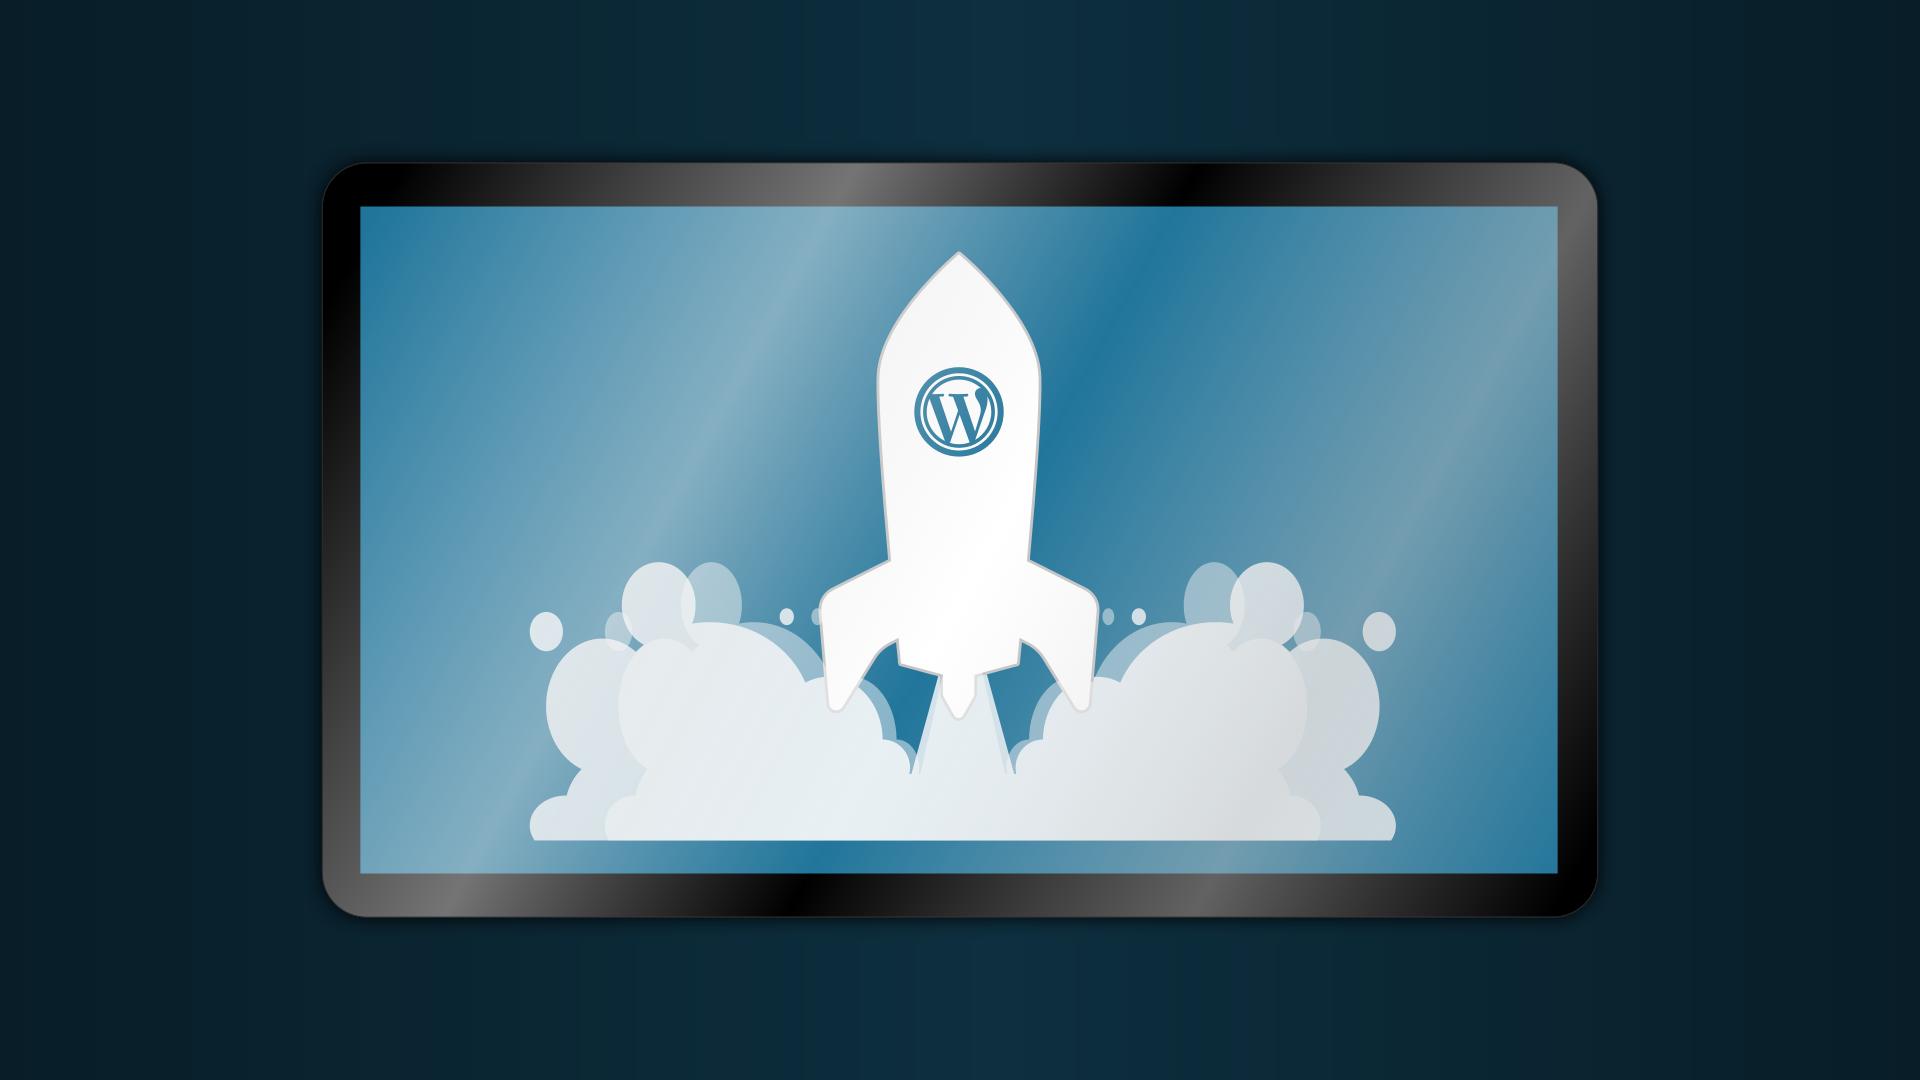 wordpress - WordPress初心者がseo対策でやるべき設定方法まとめ